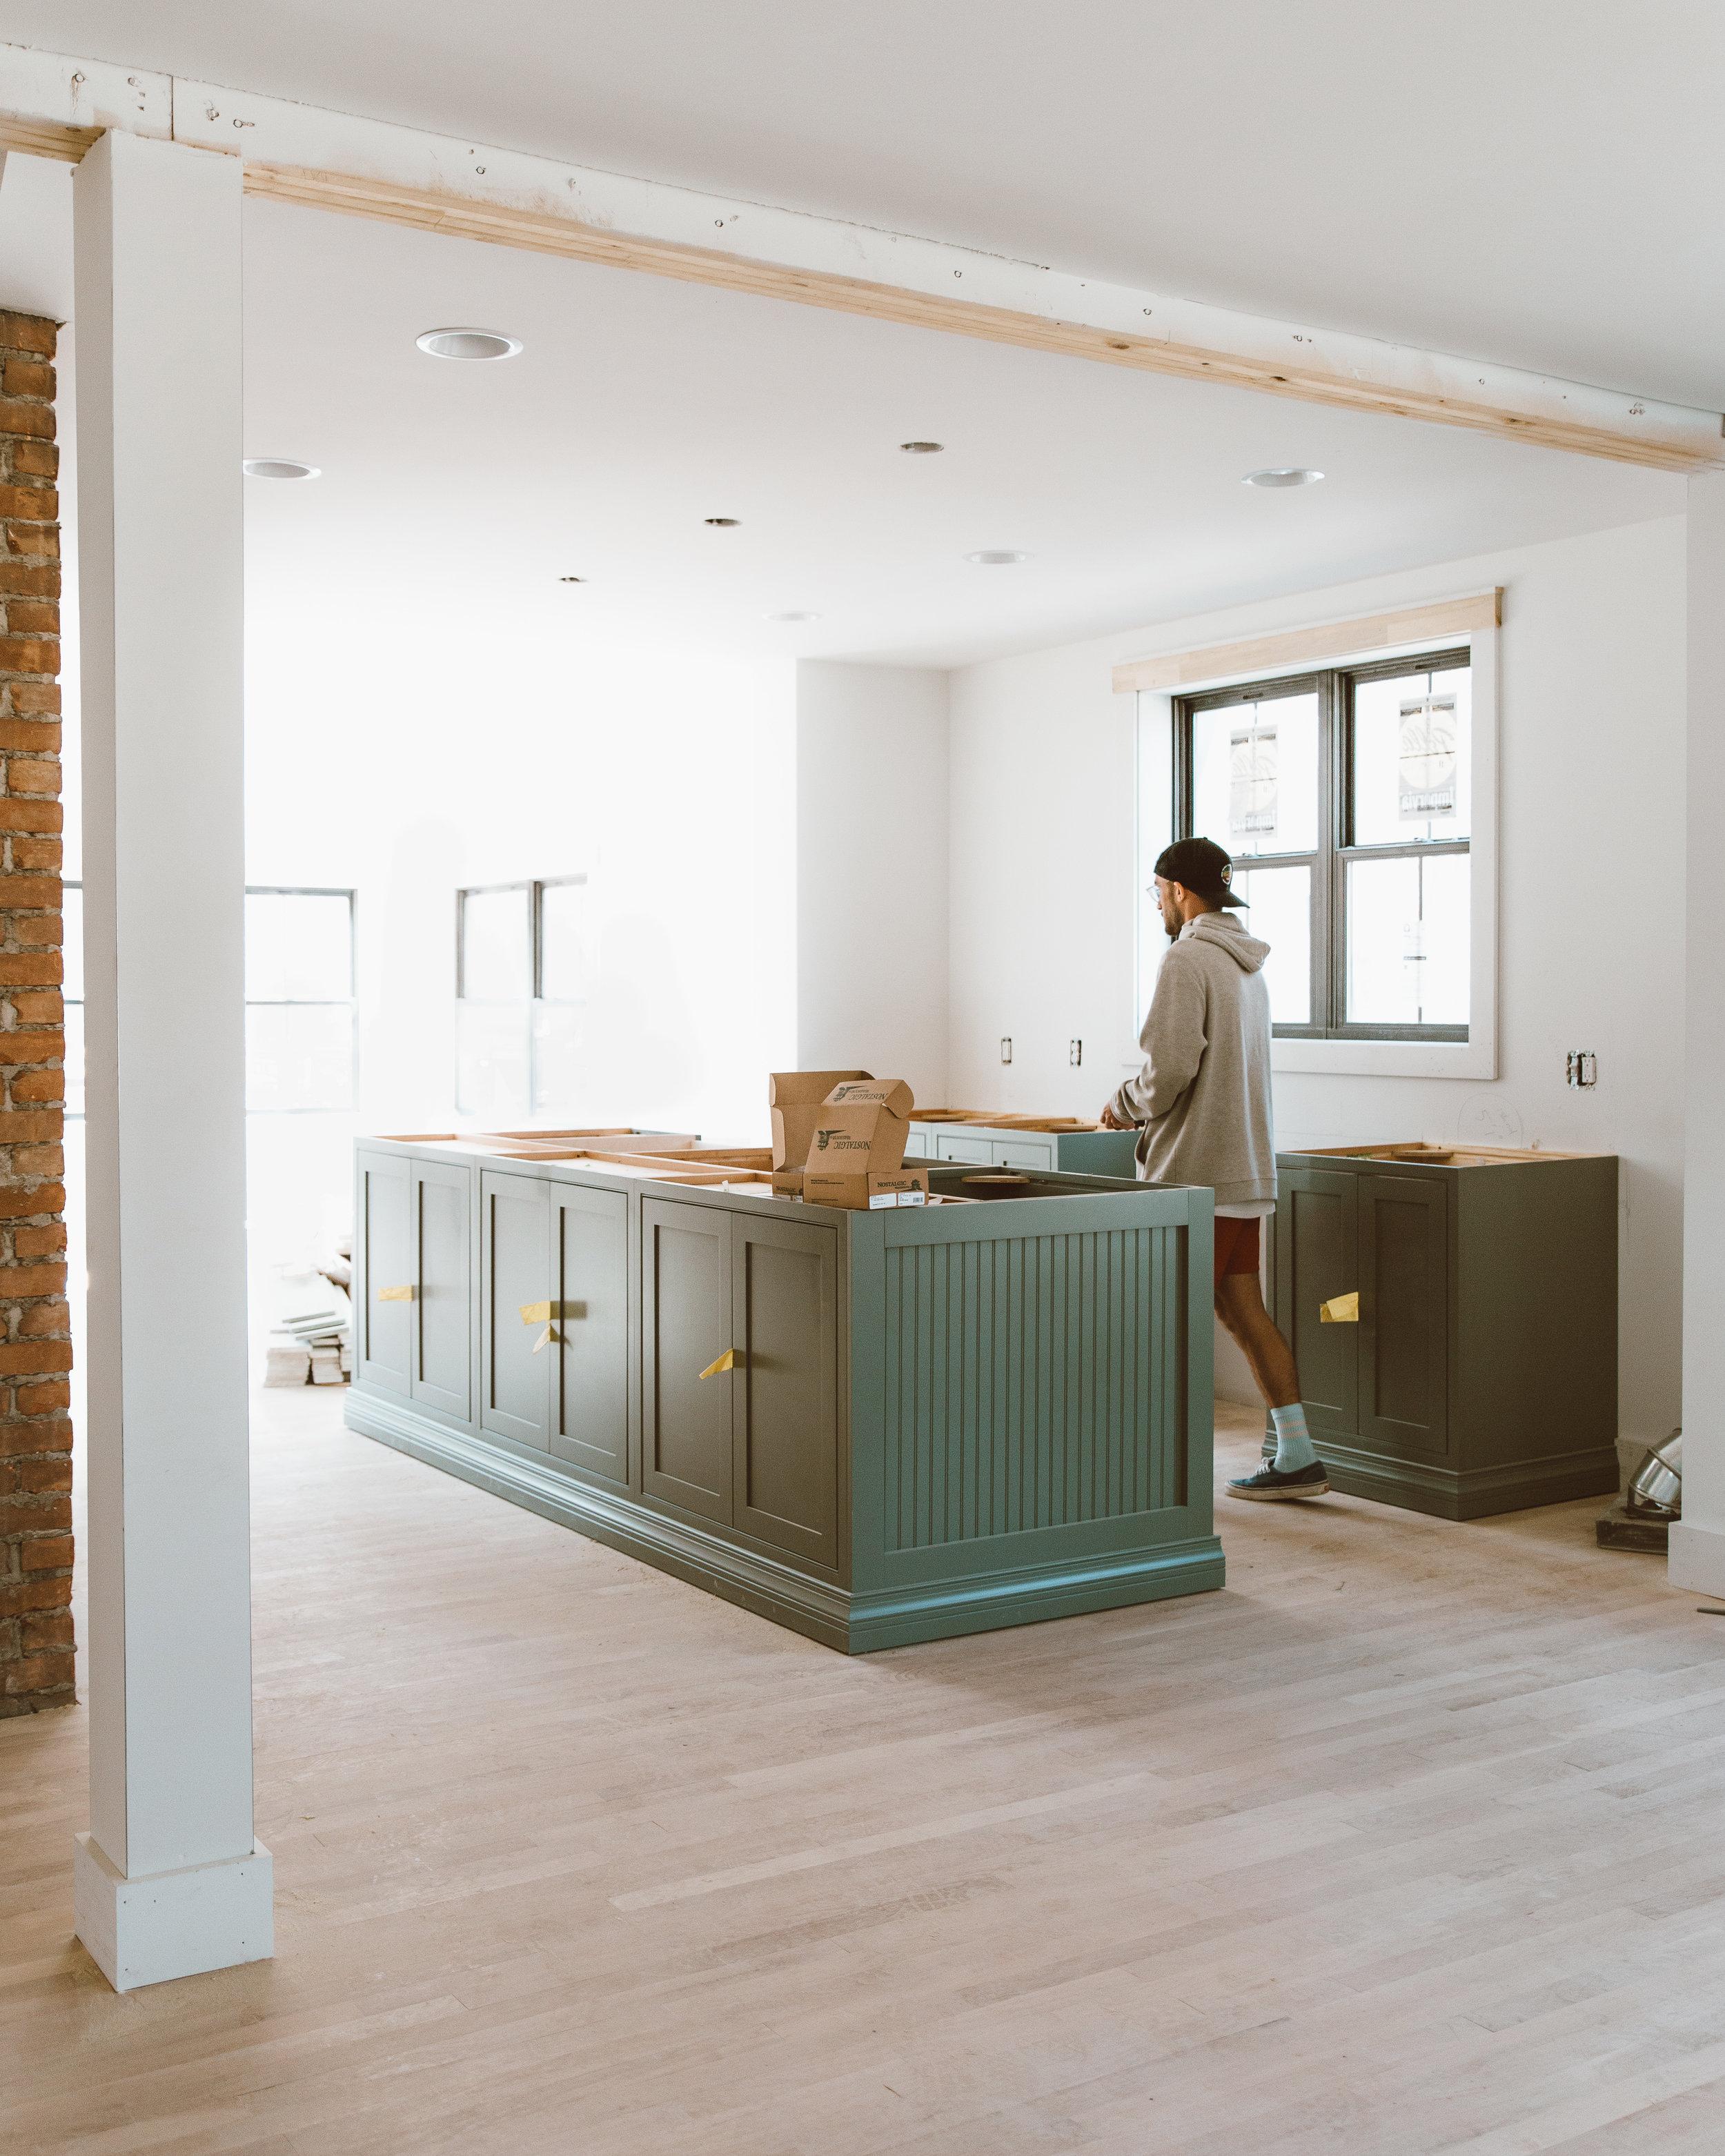 forthehome-kitchencabinets4.jpg